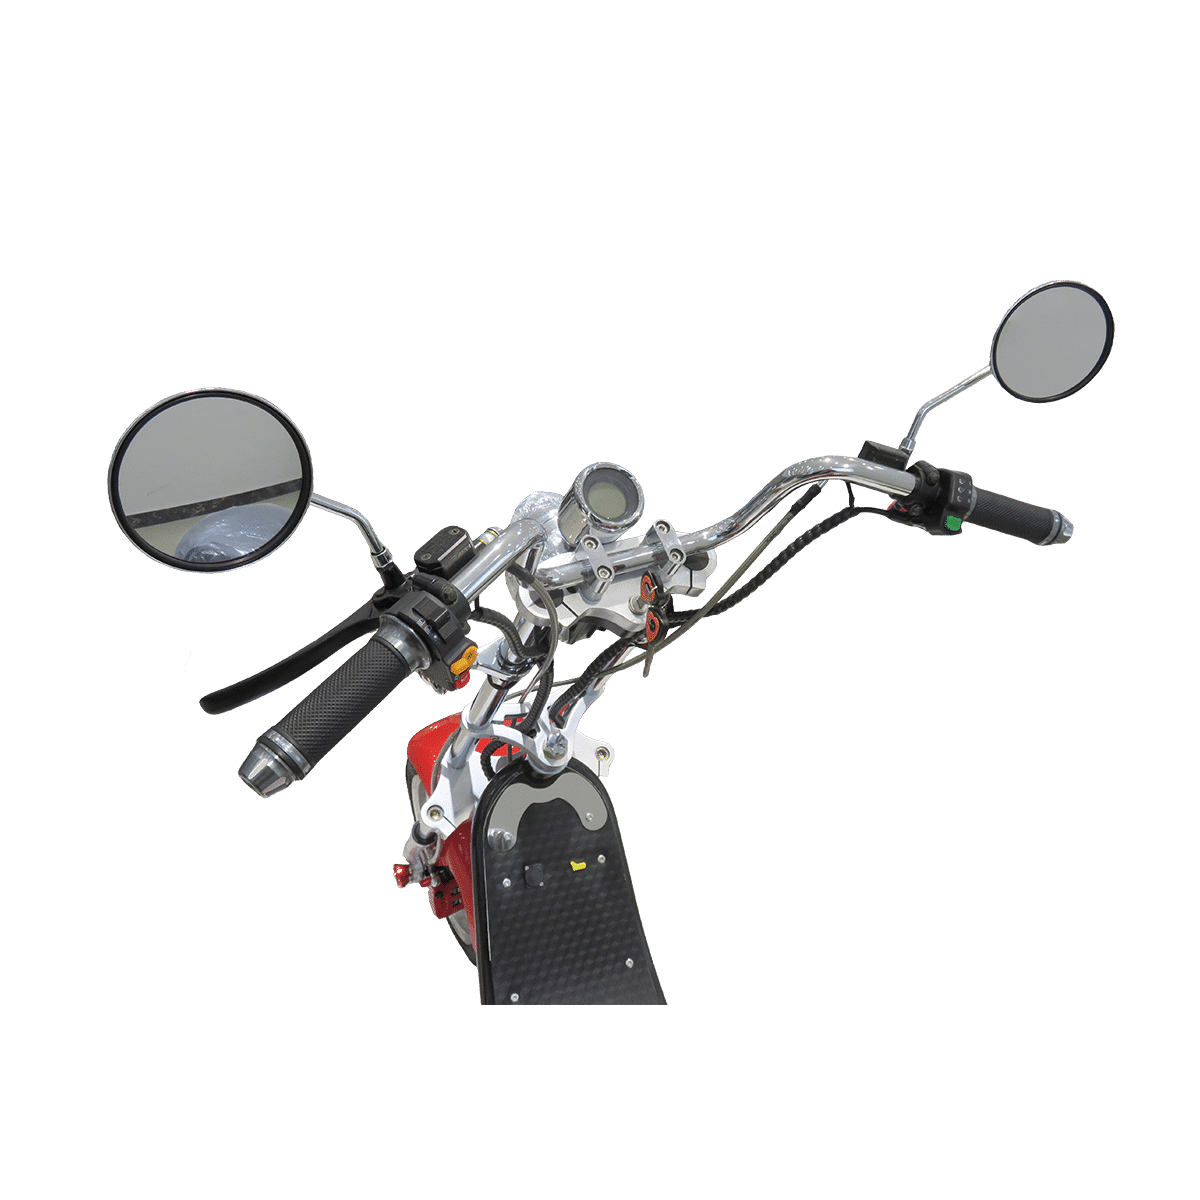 Compteur de vitesse Citycoco Harley 2